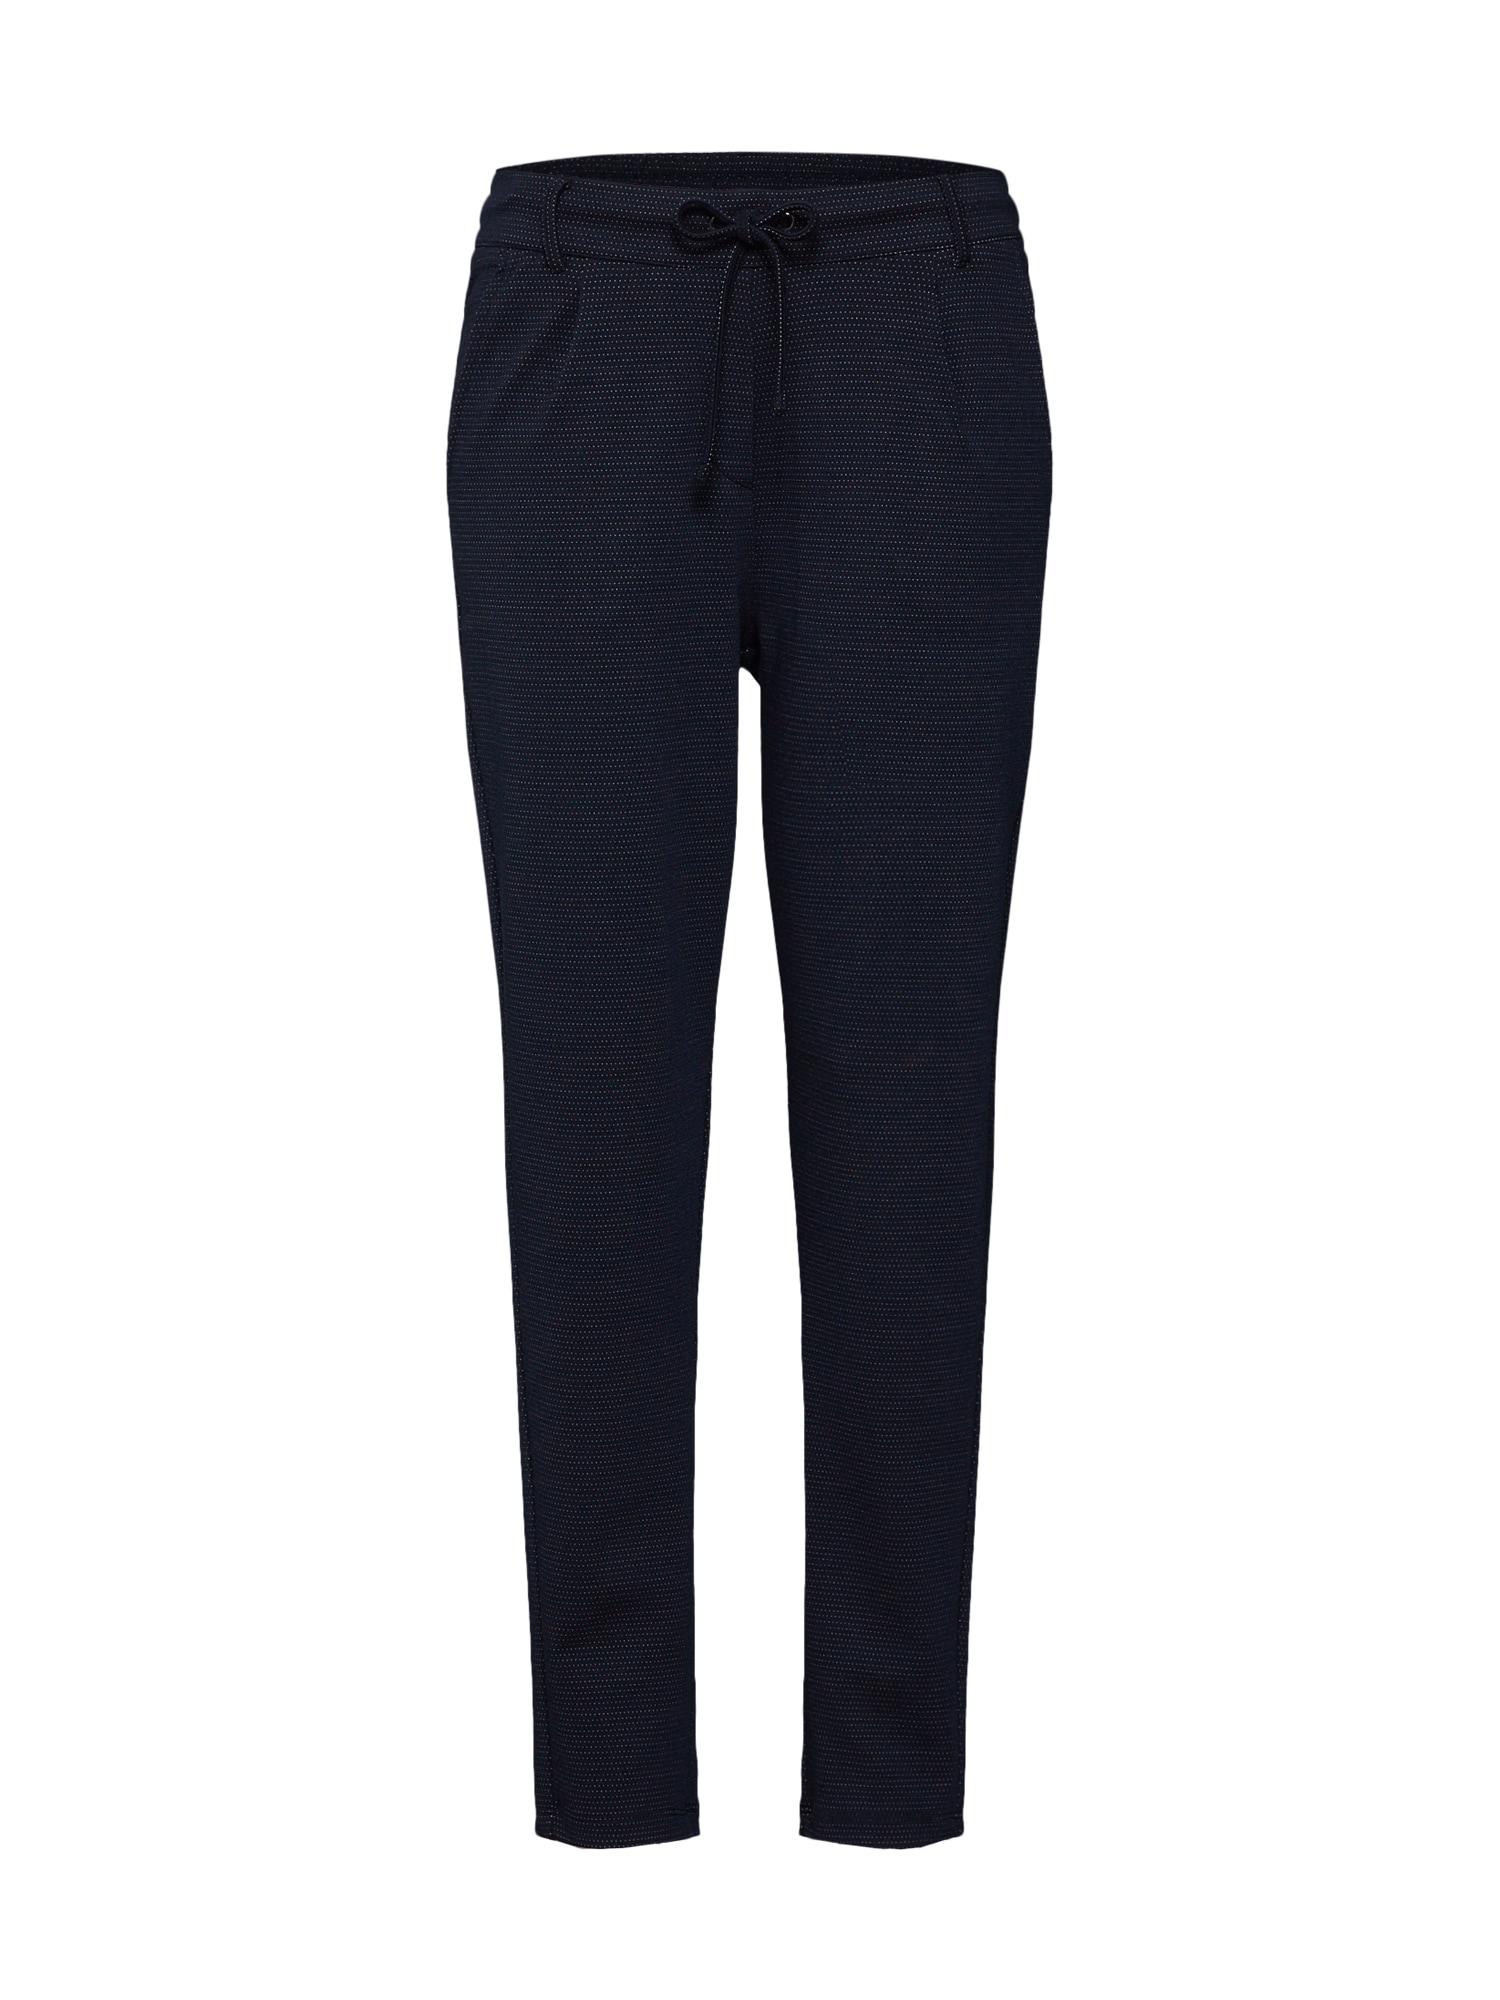 Kalhoty modrá TOM TAILOR